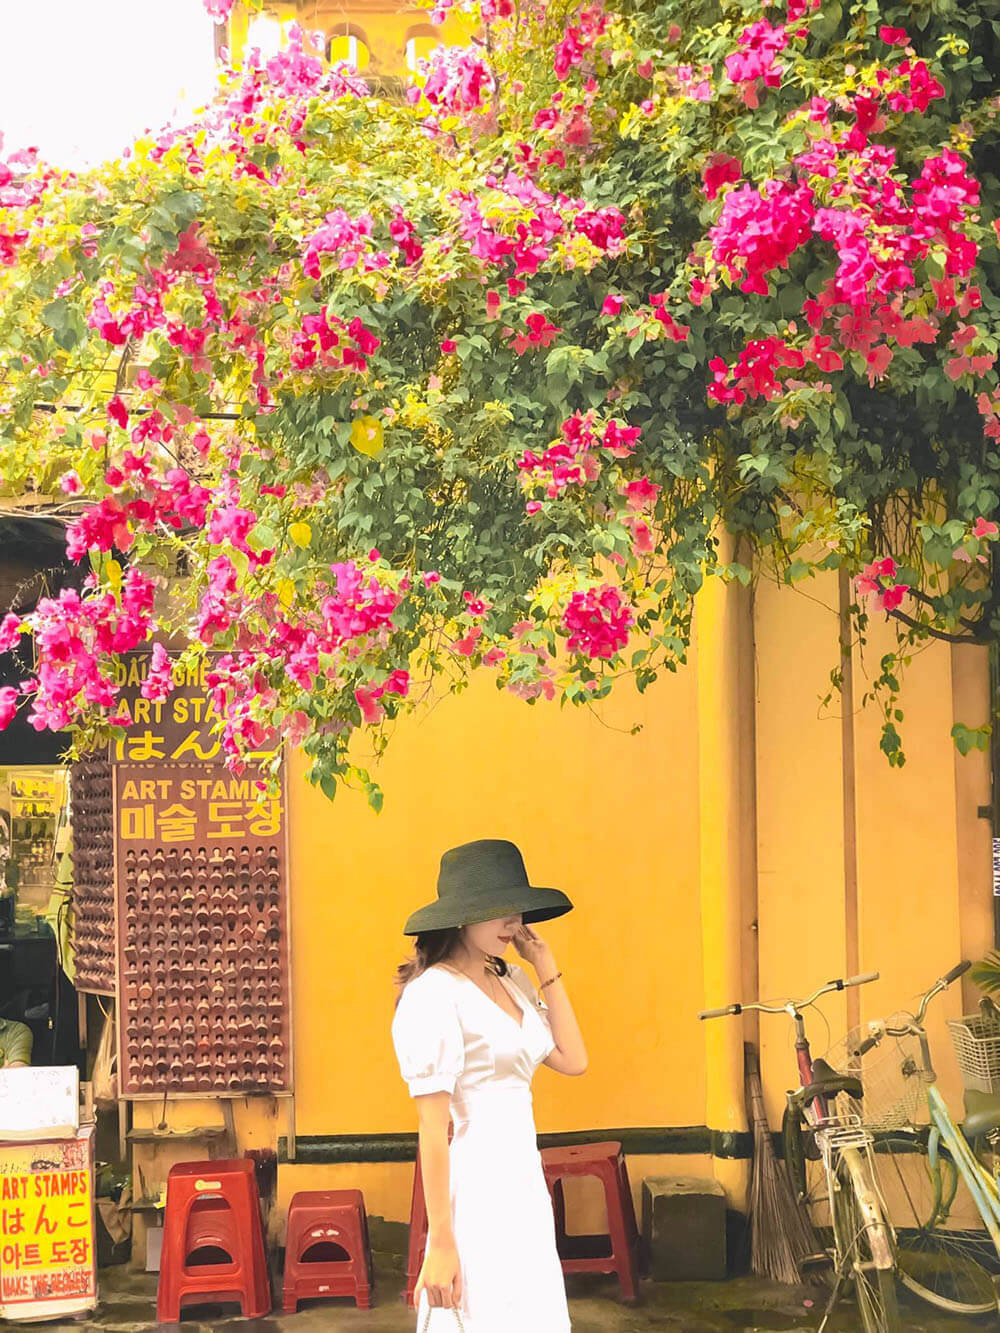 Pho Co Hoi An Review Hue Da Nang Hoi An Ninh Binh 7n7d Chi Voi 8 Trieu Tin Duoc Khong 04